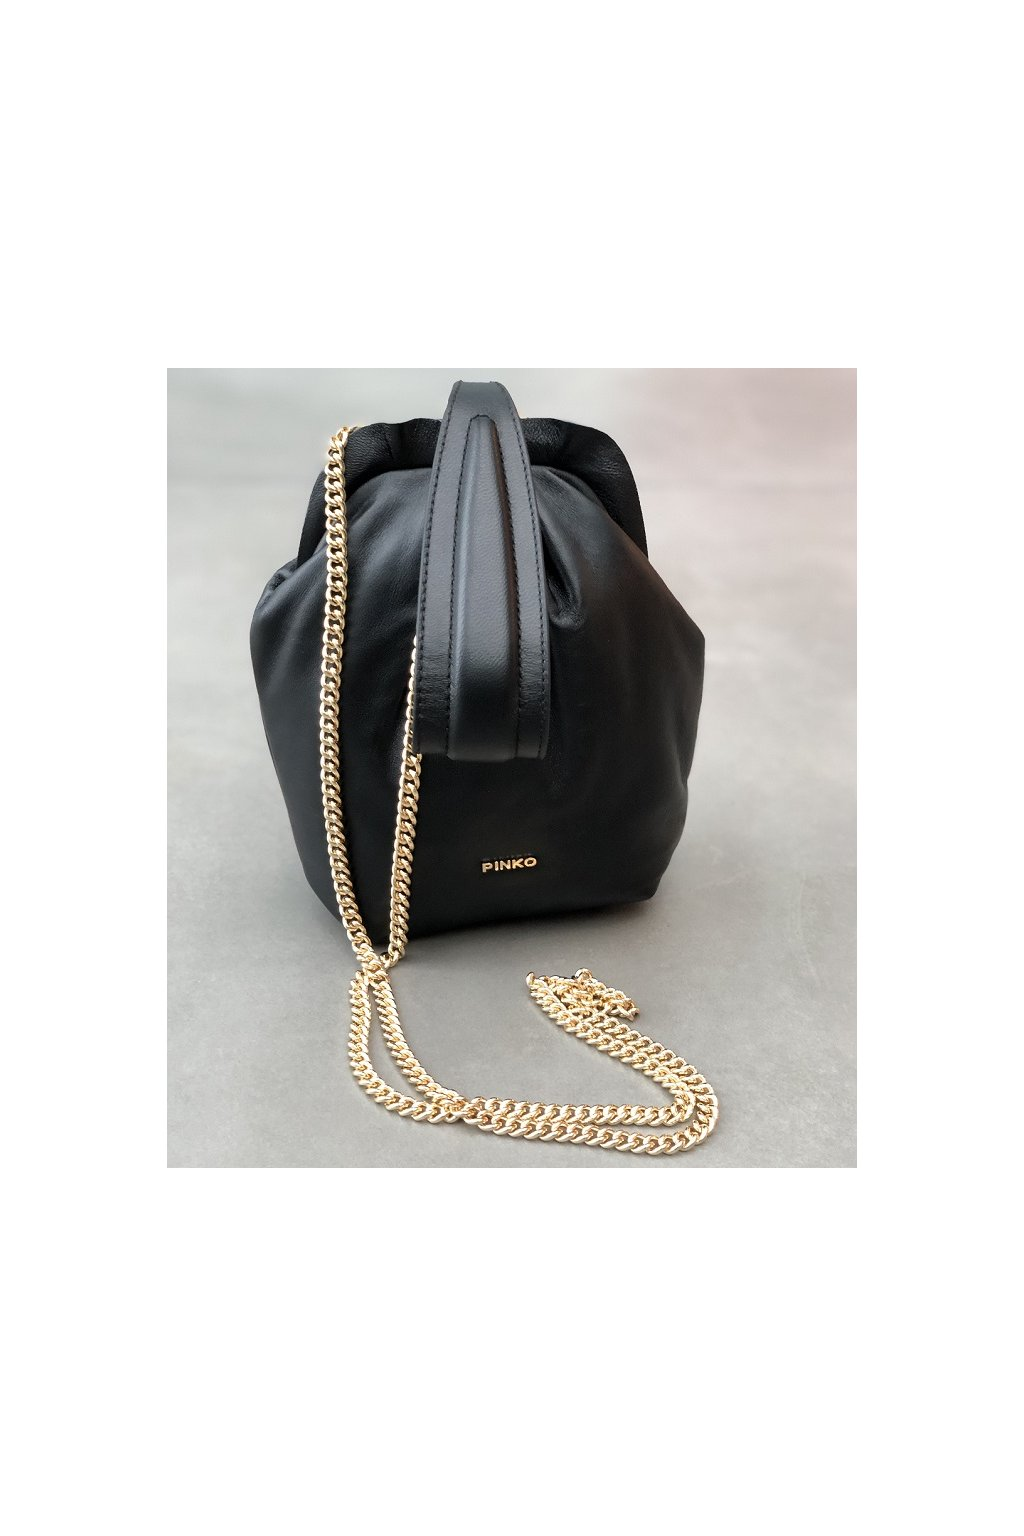 1P2238 Y6Y8 Z99 Dámská kabelka Pinko Soft Pouch Fraimed Chain Fl černá